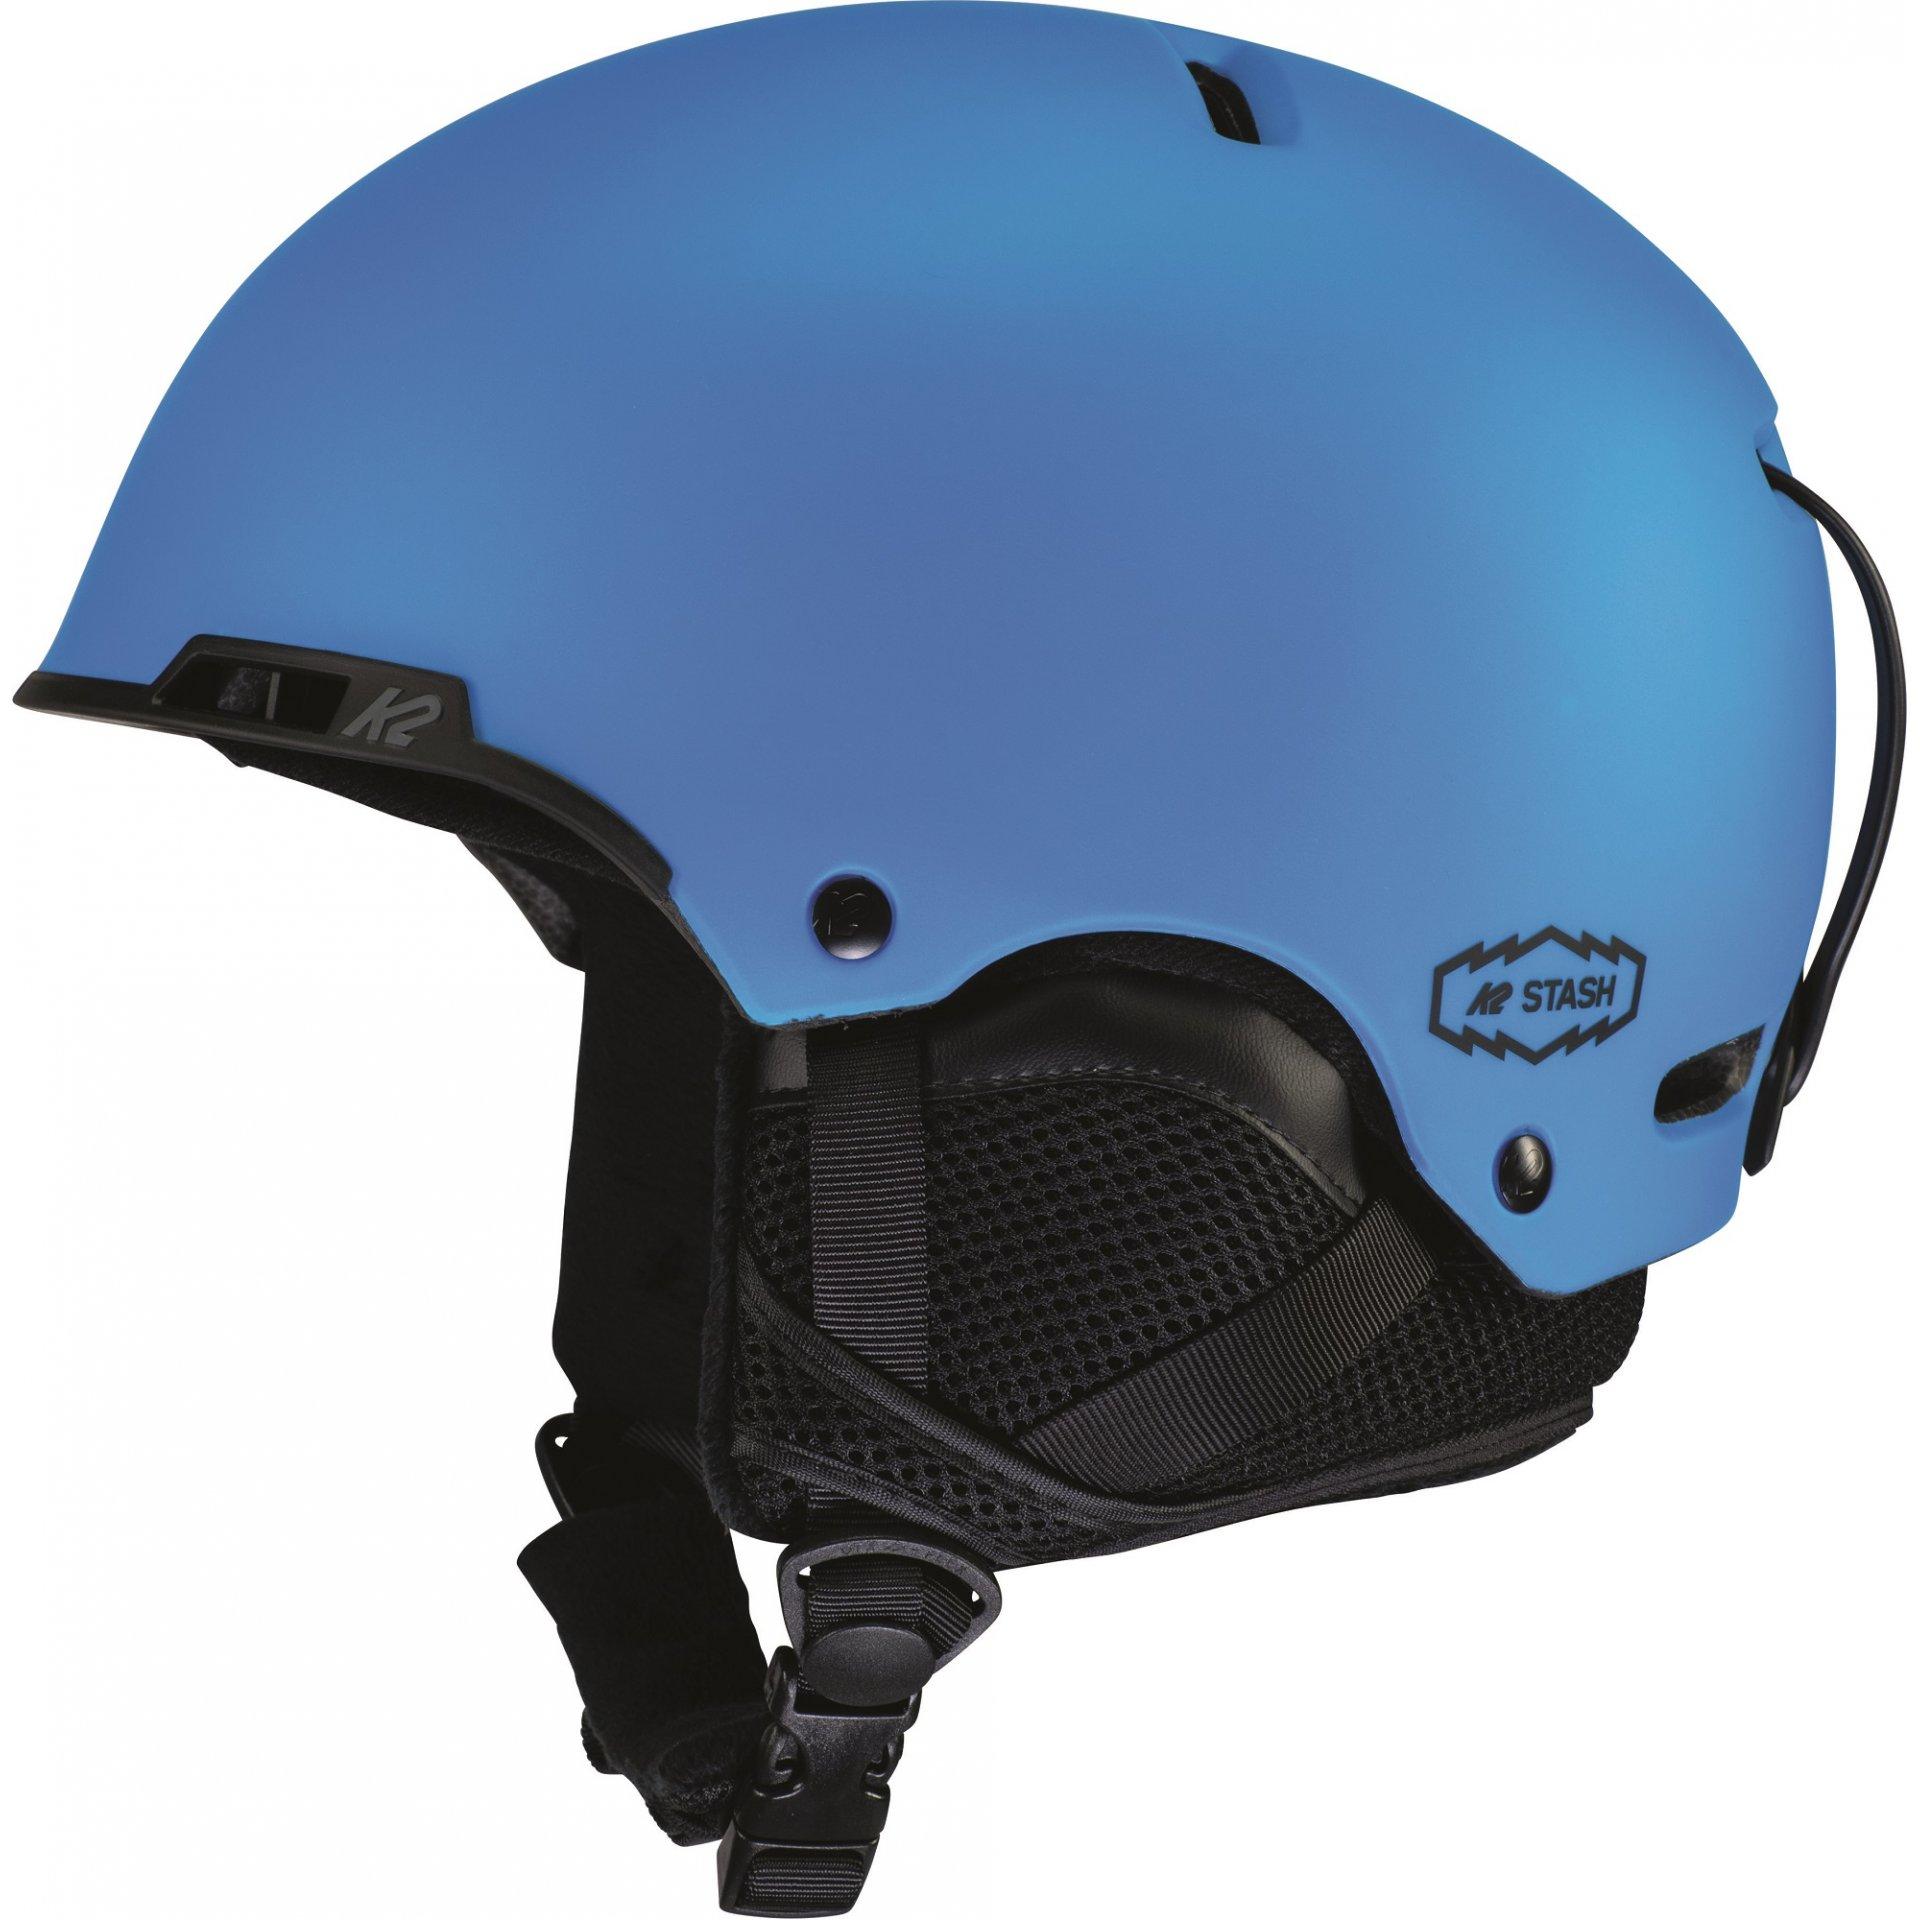 KASK K2 STASH 10E4001 42 BLUE